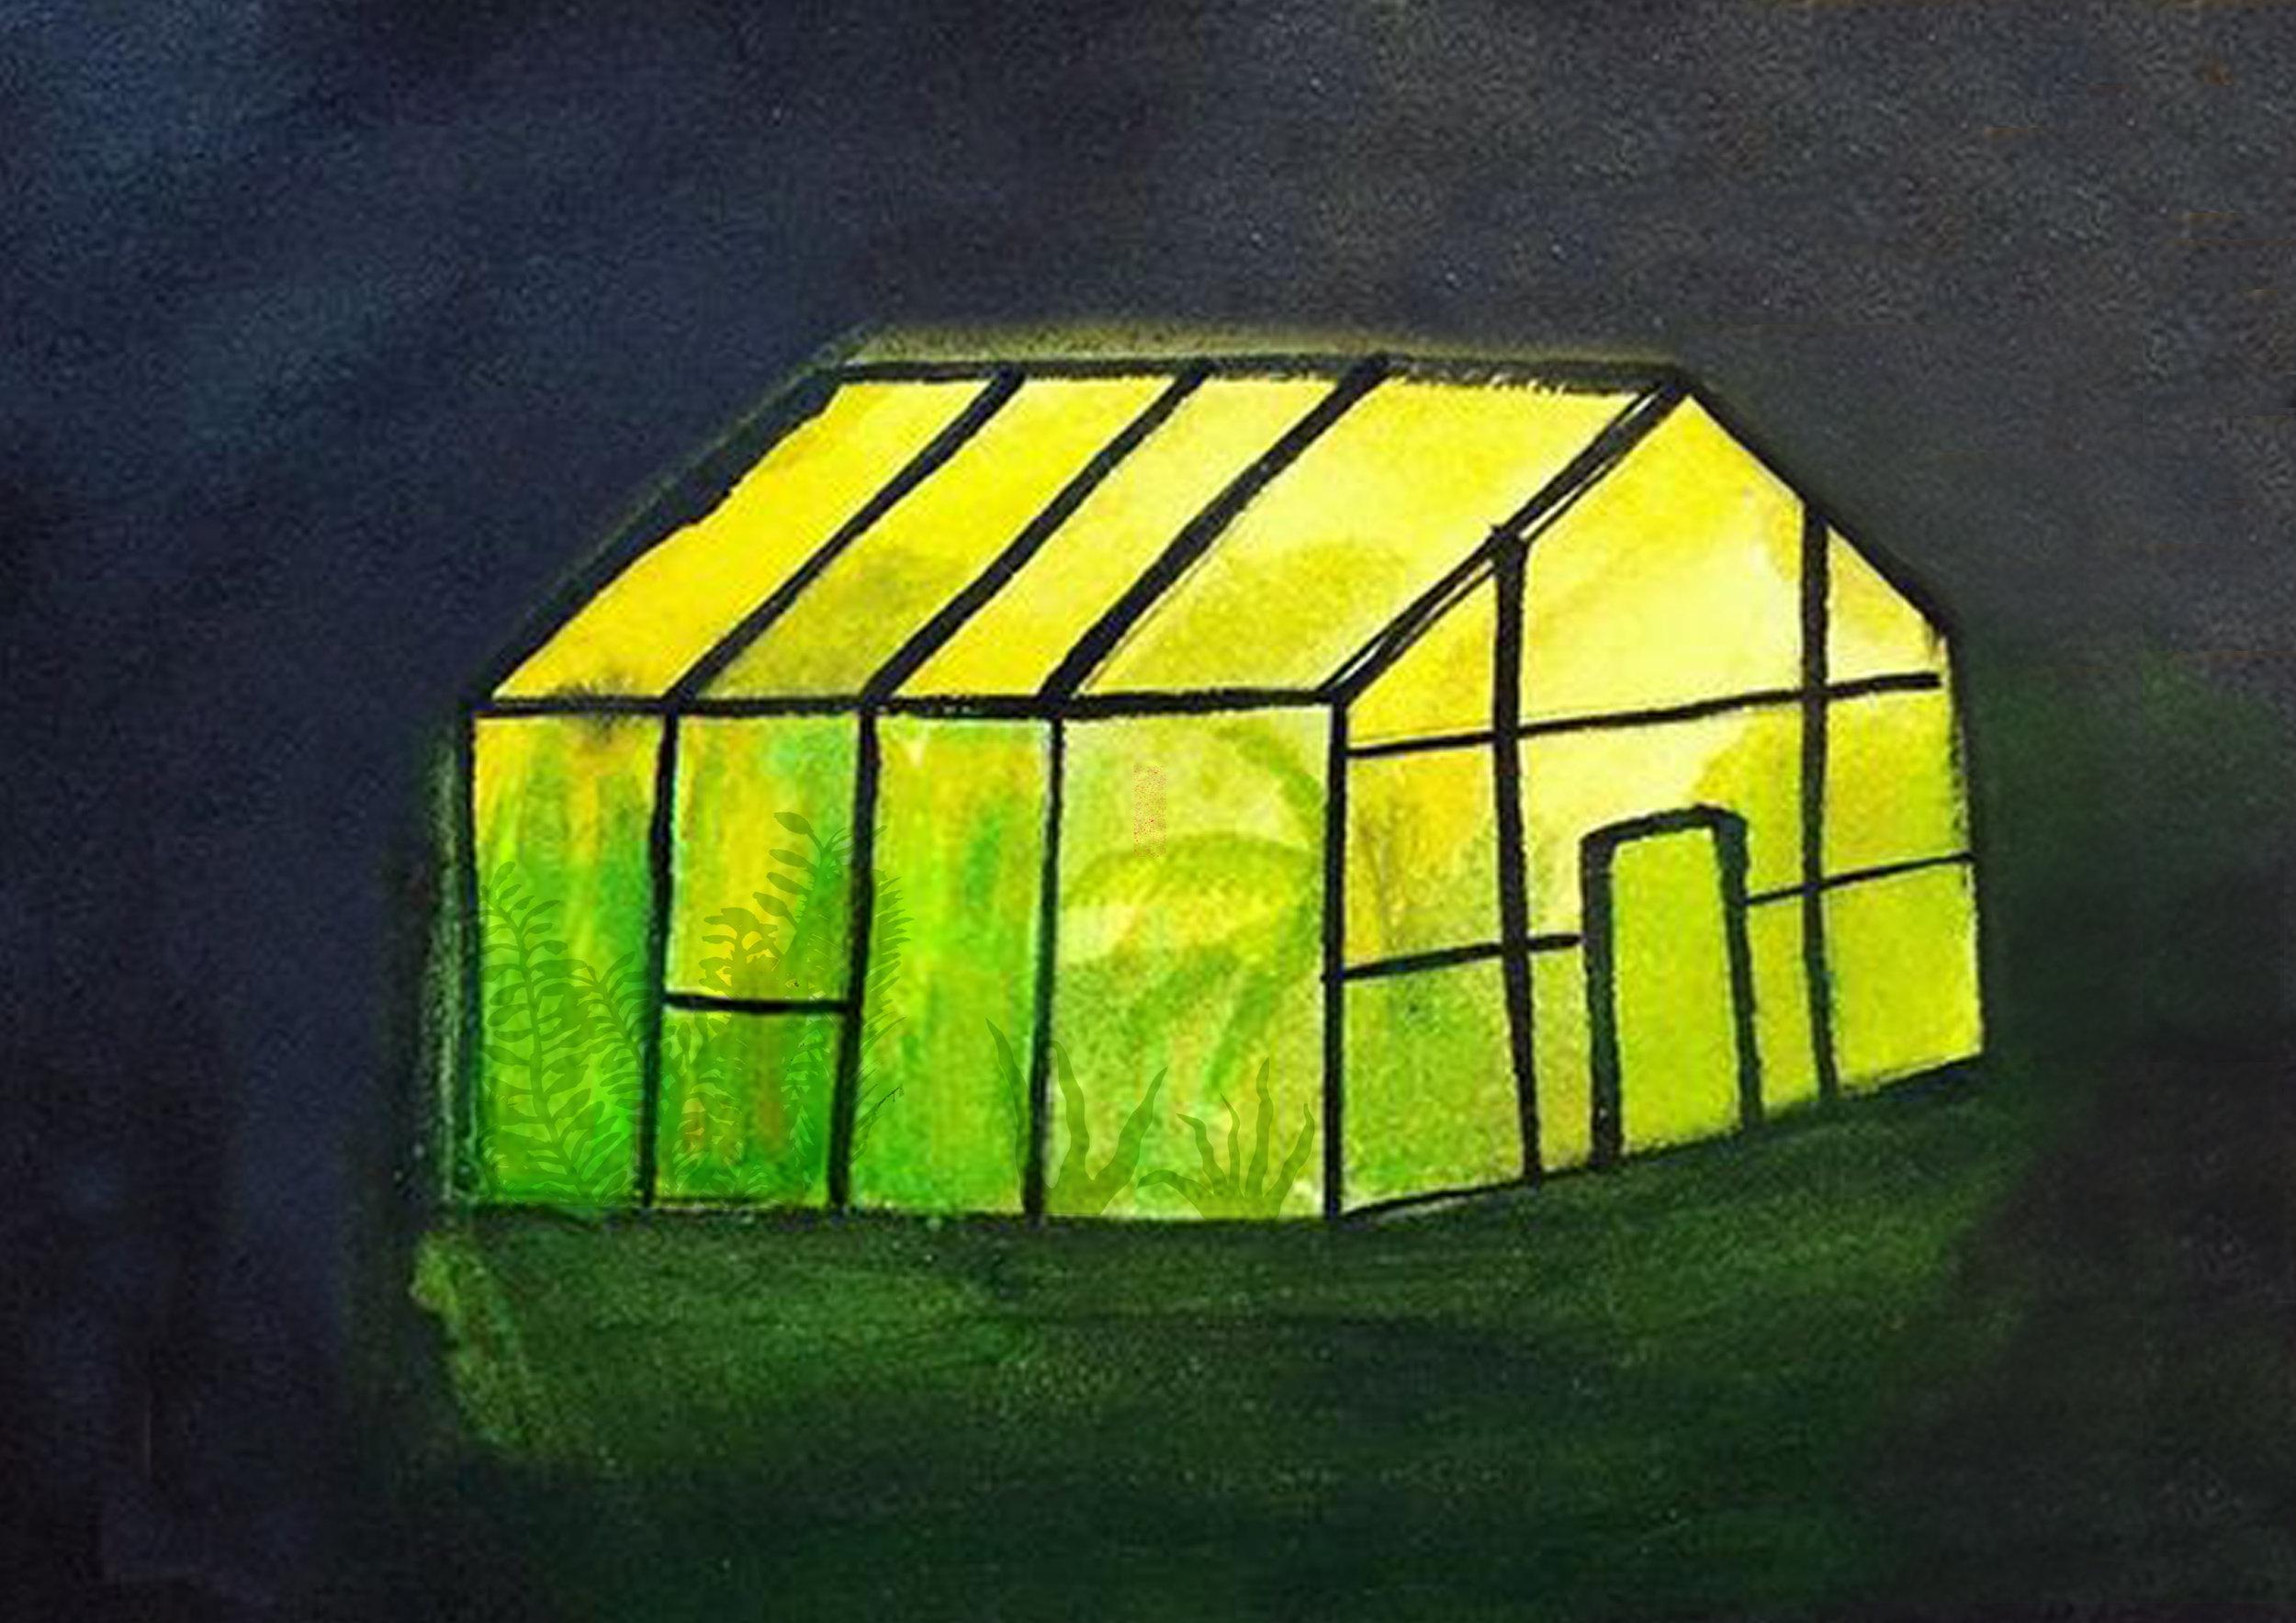 greenhousenew.jpg